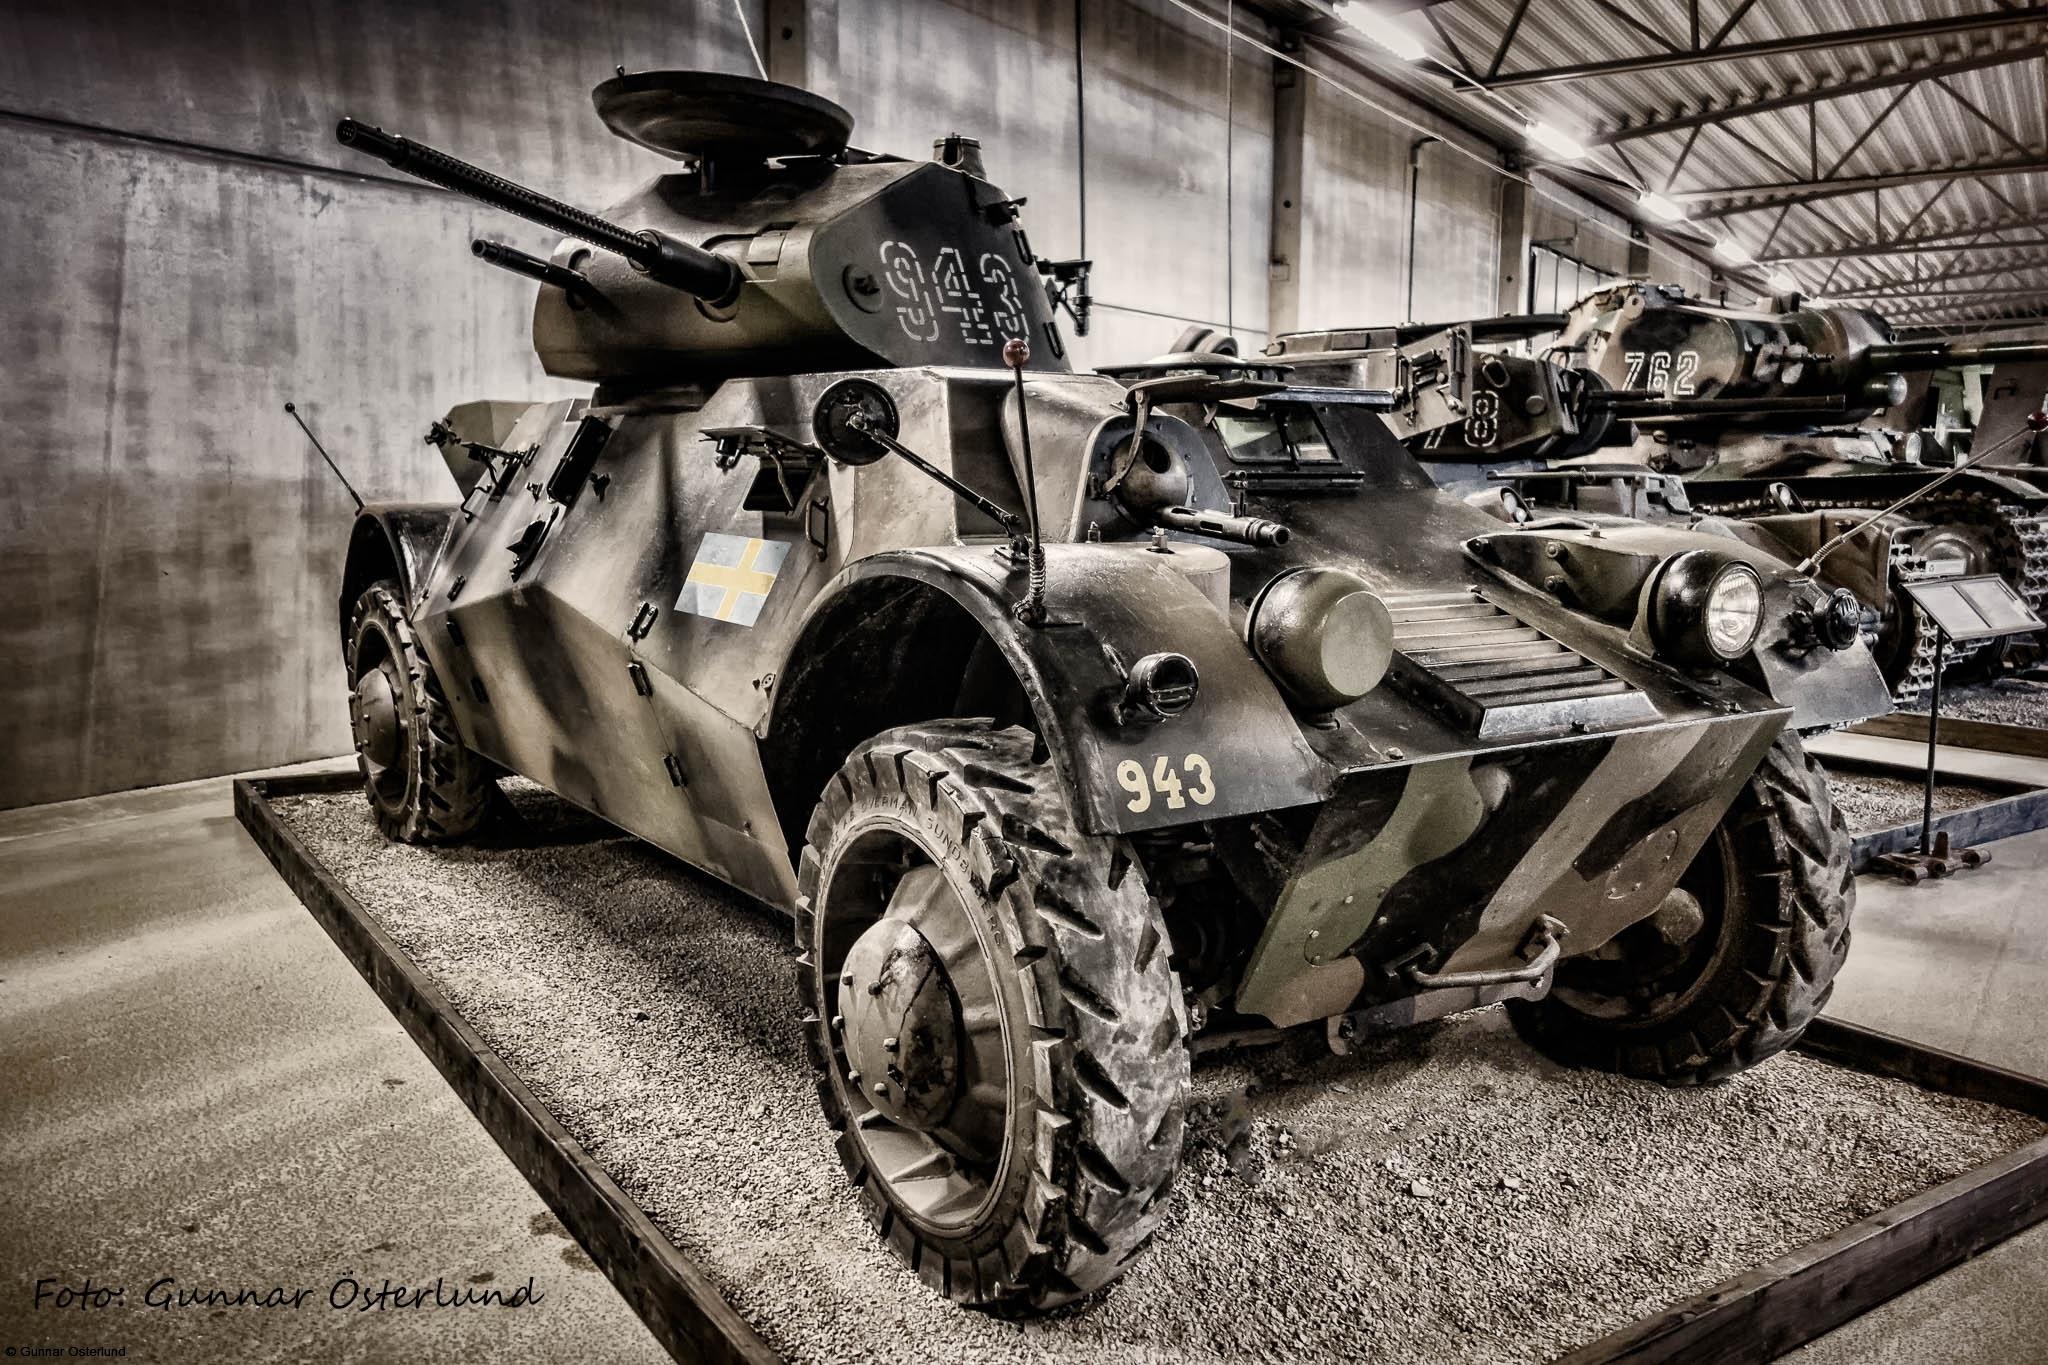 Pansarbil m/40, även kallad Lynx.